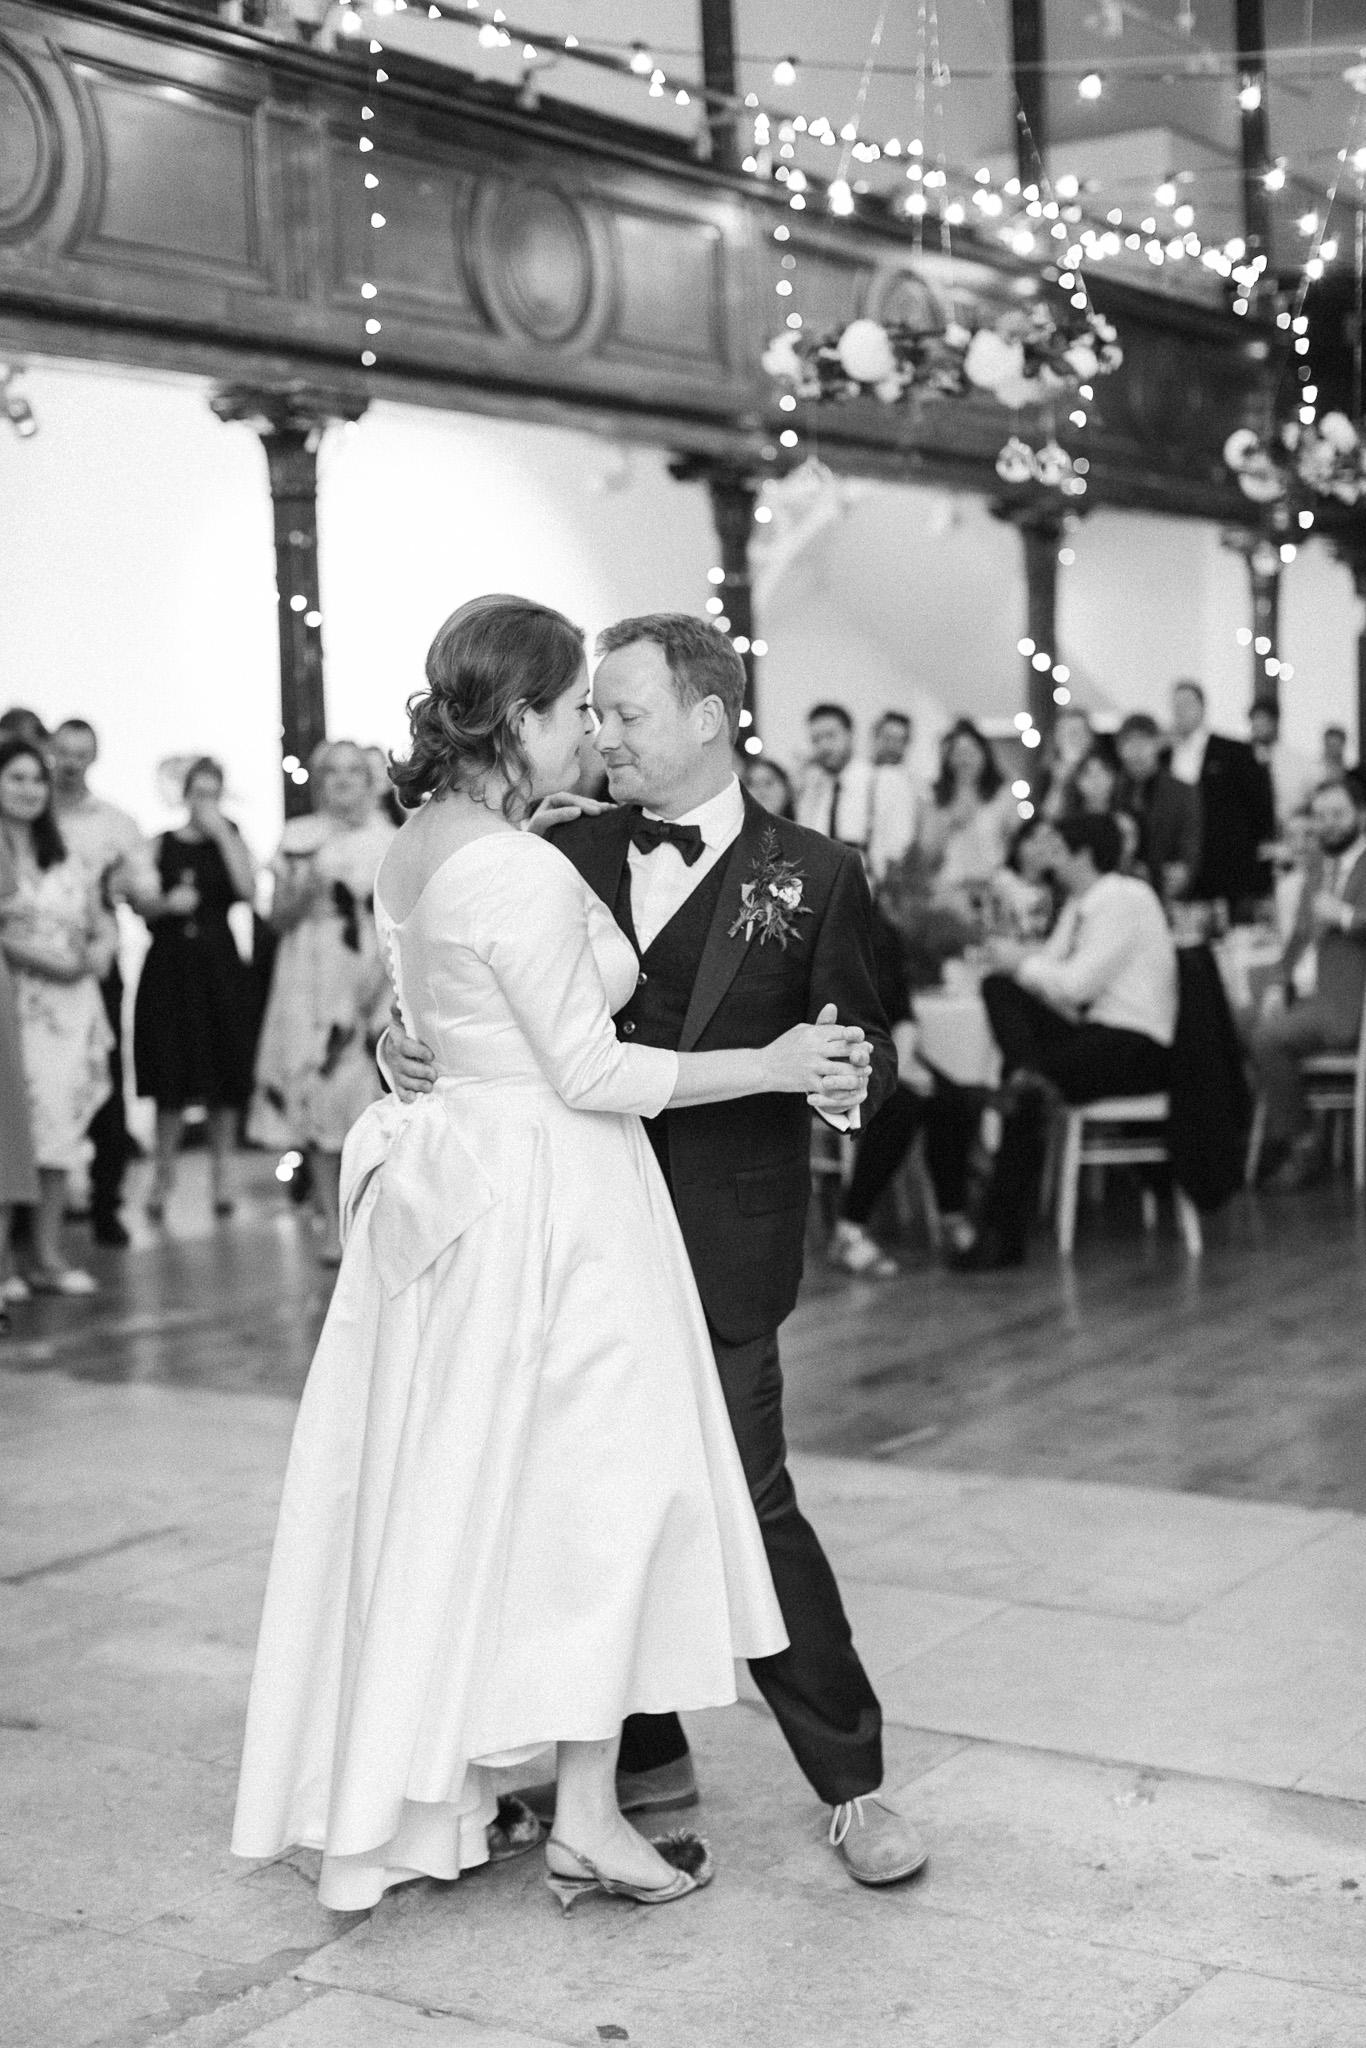 st_andrews_fabrica_brighton_wedding_621.jpg